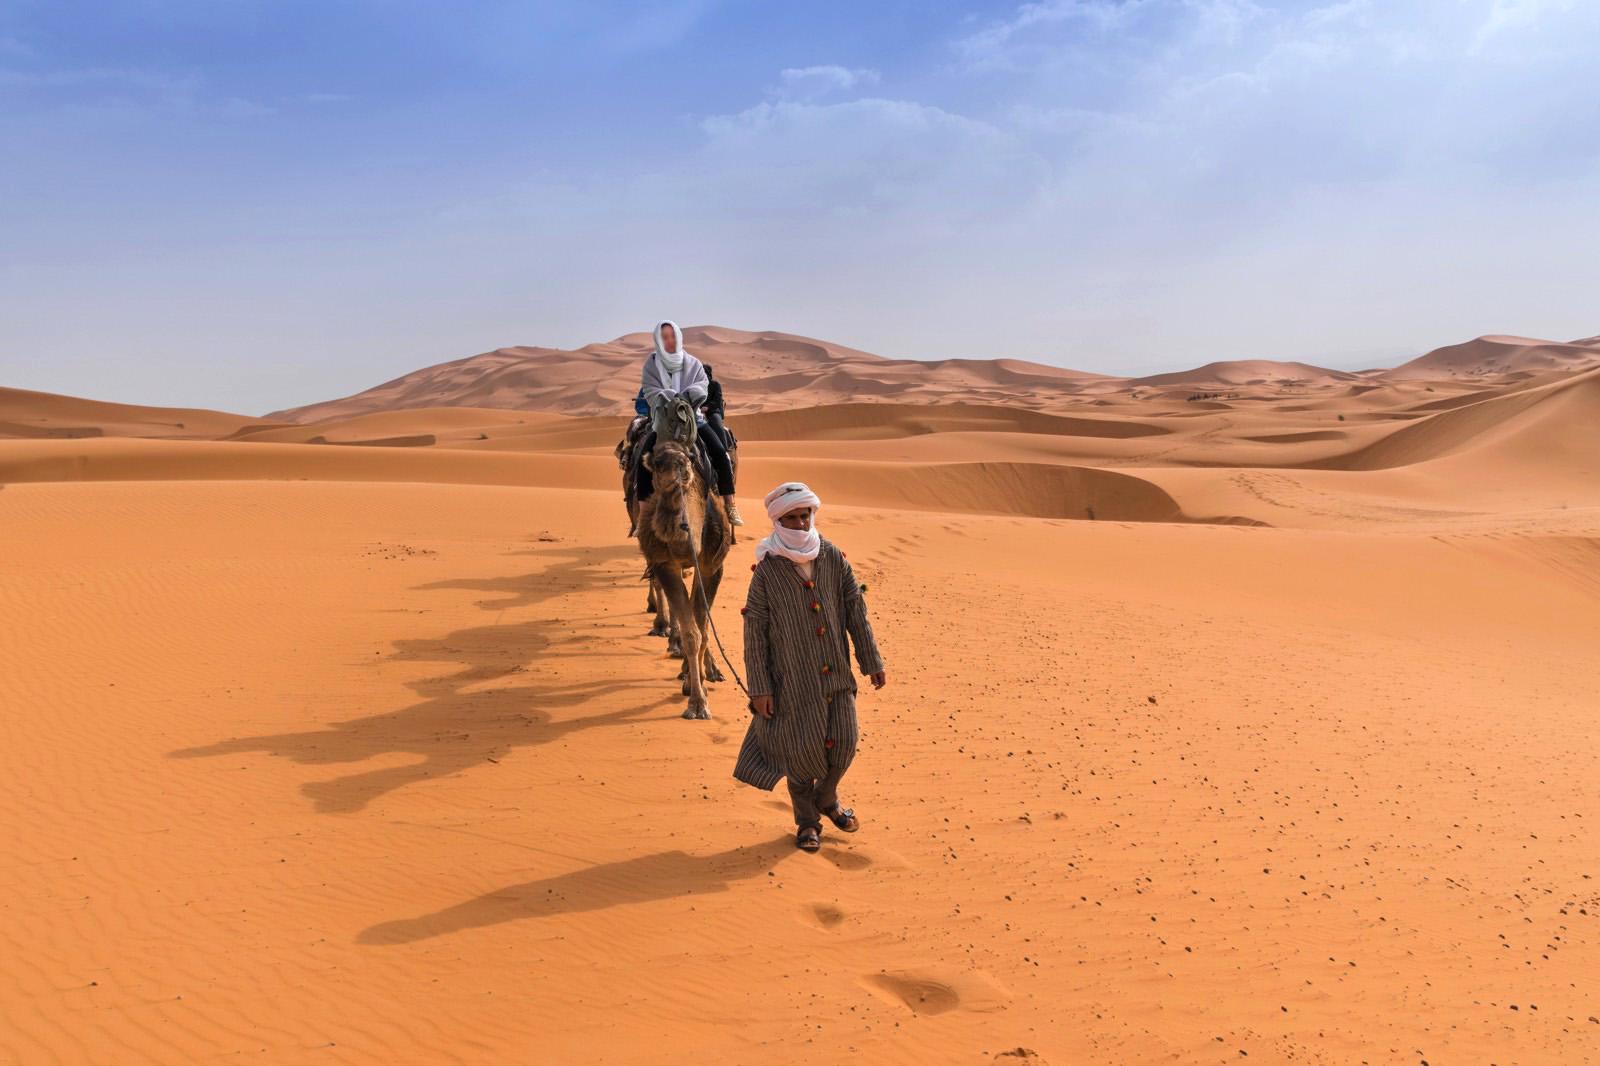 dromadaire-desert-au-maroc-1559038844